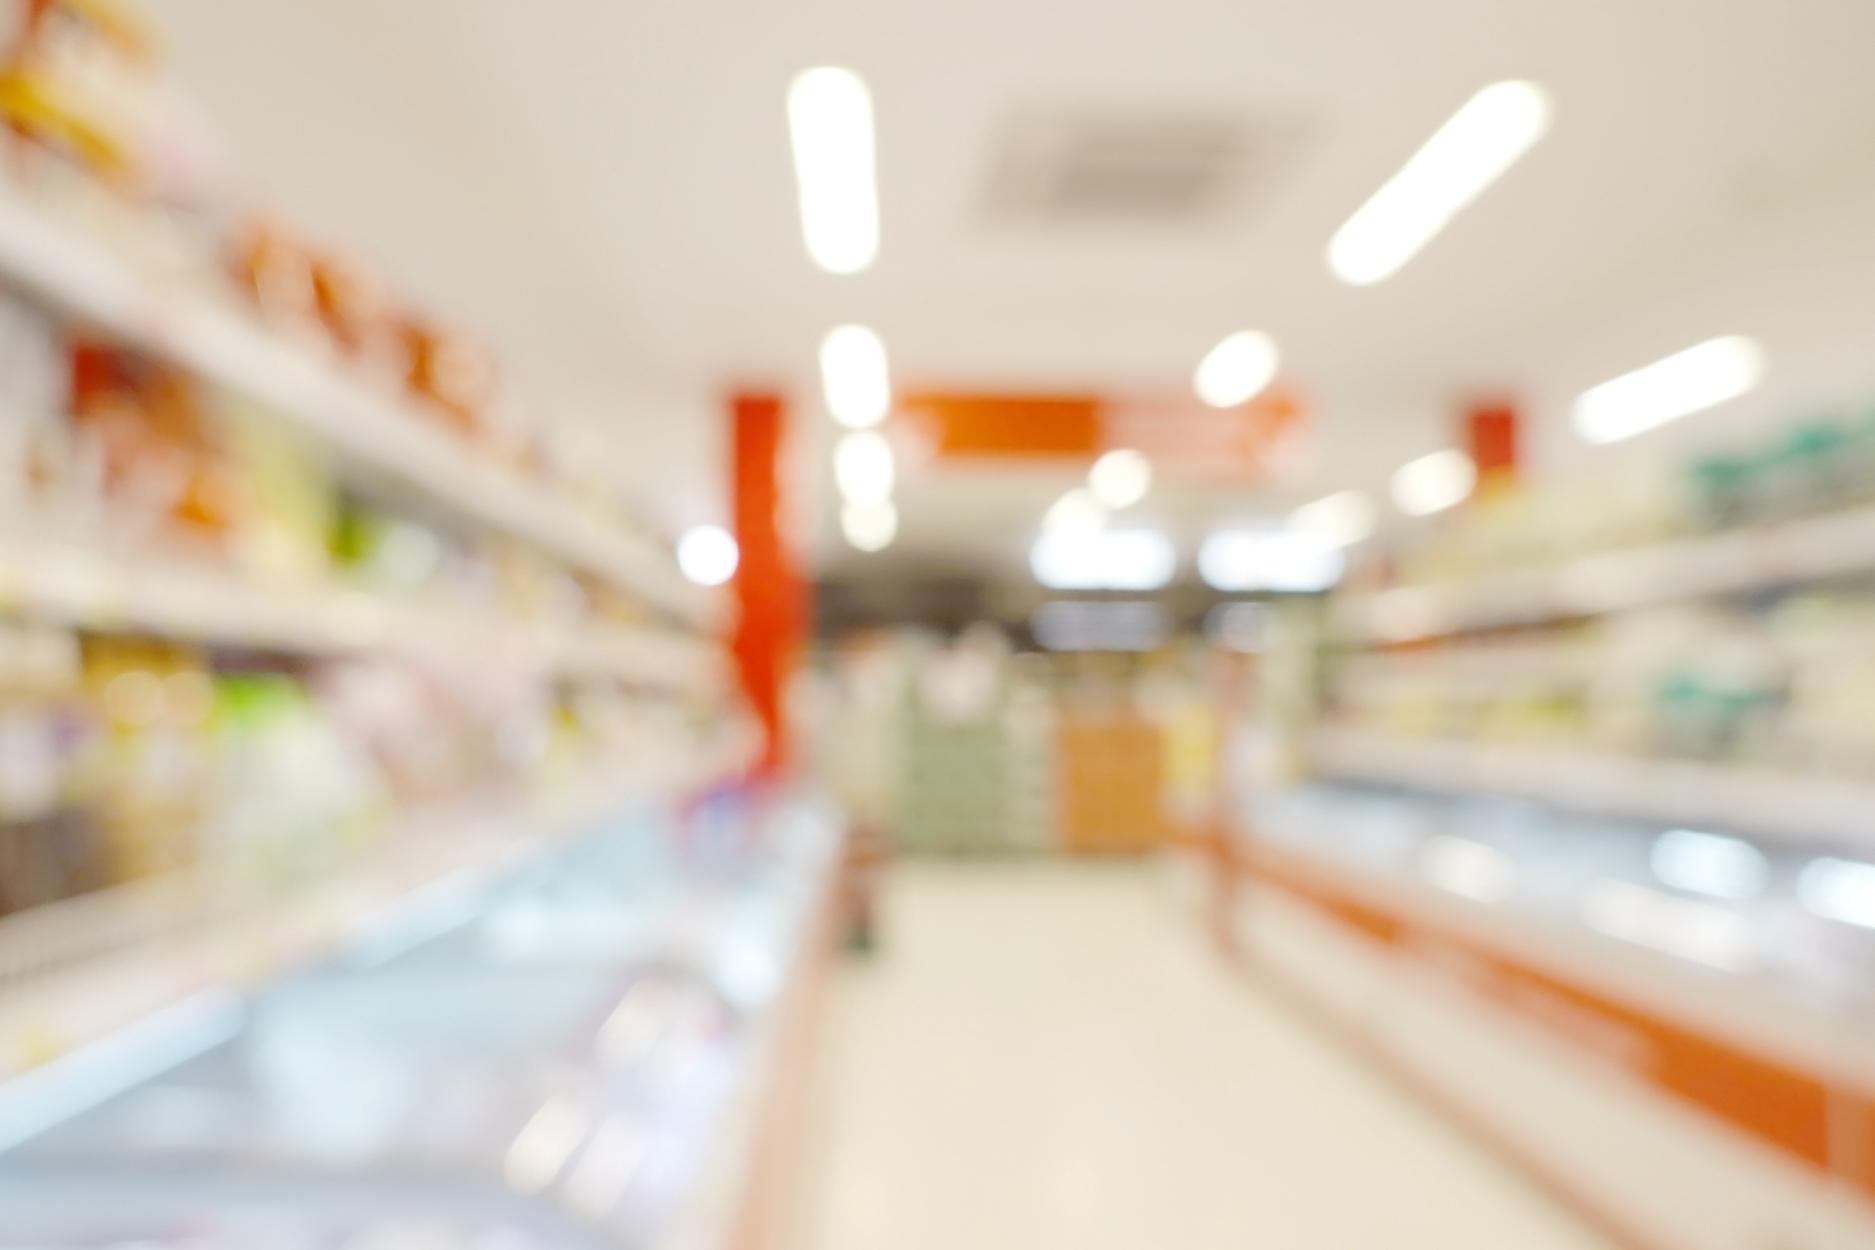 Blurry supermarket aisle